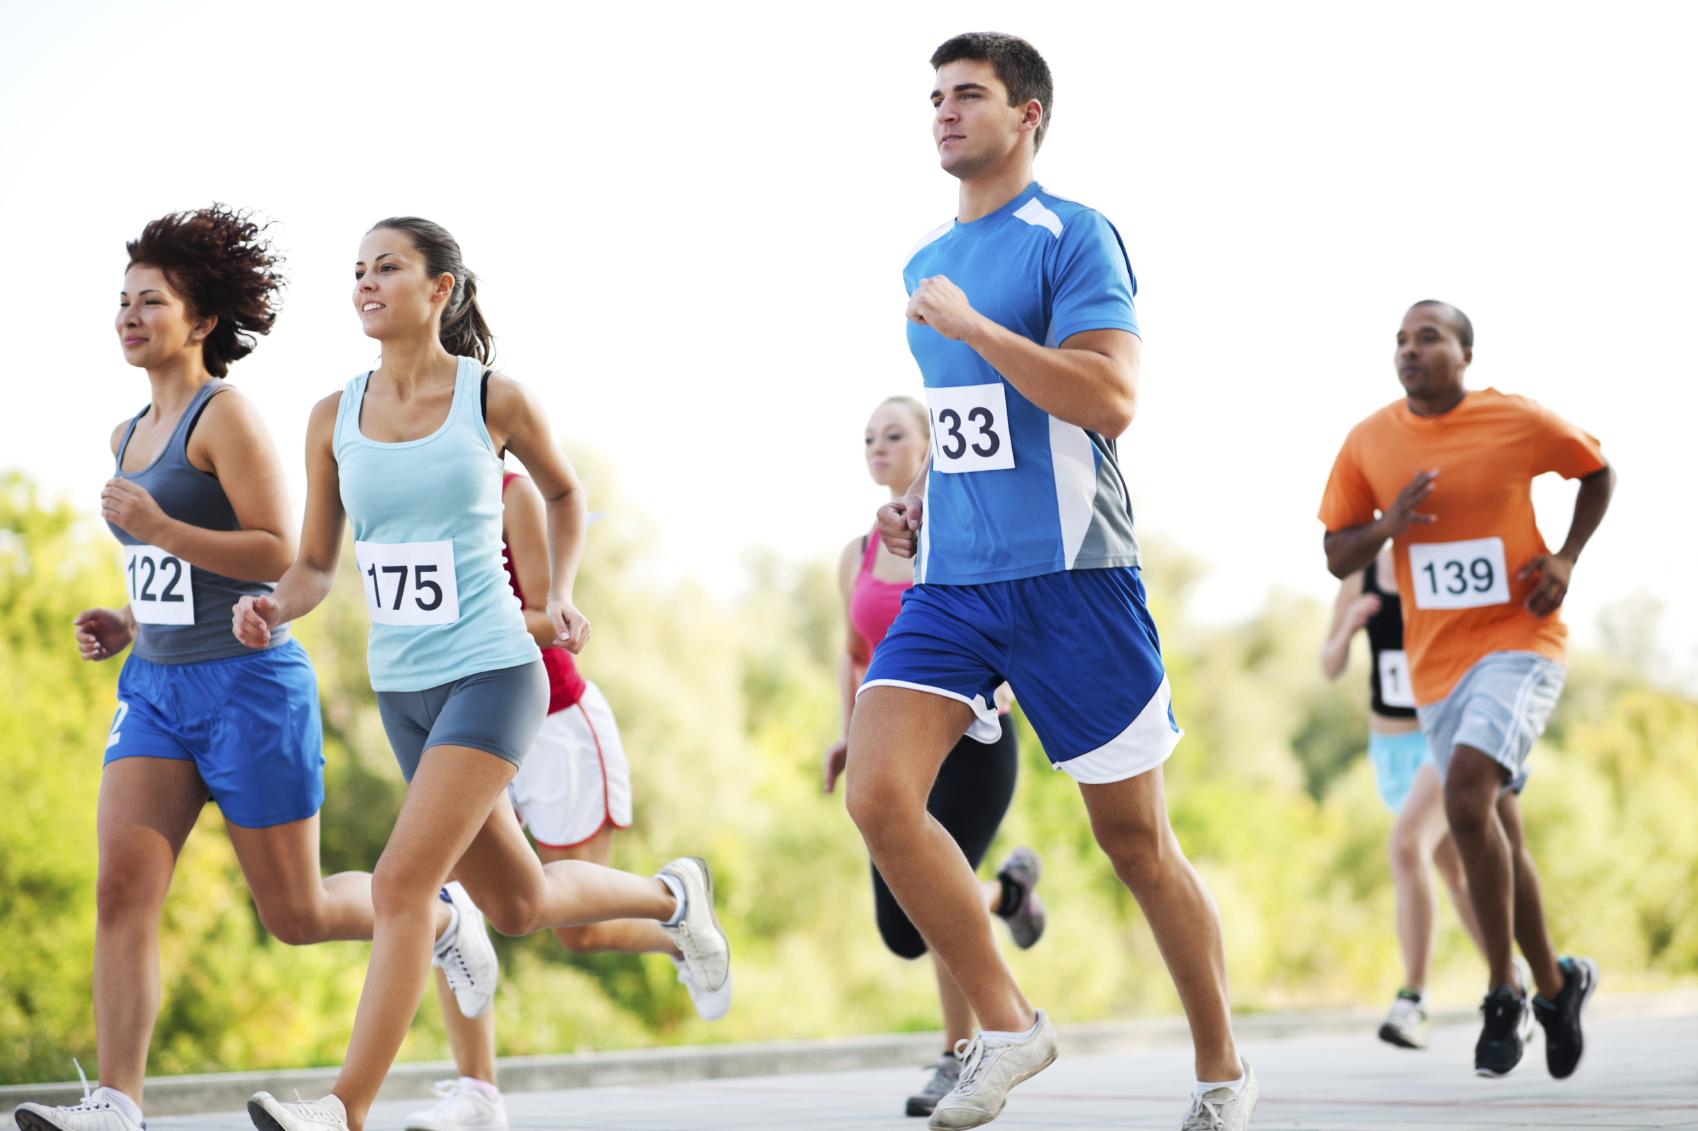 Runners/Jogging, Sports Massage